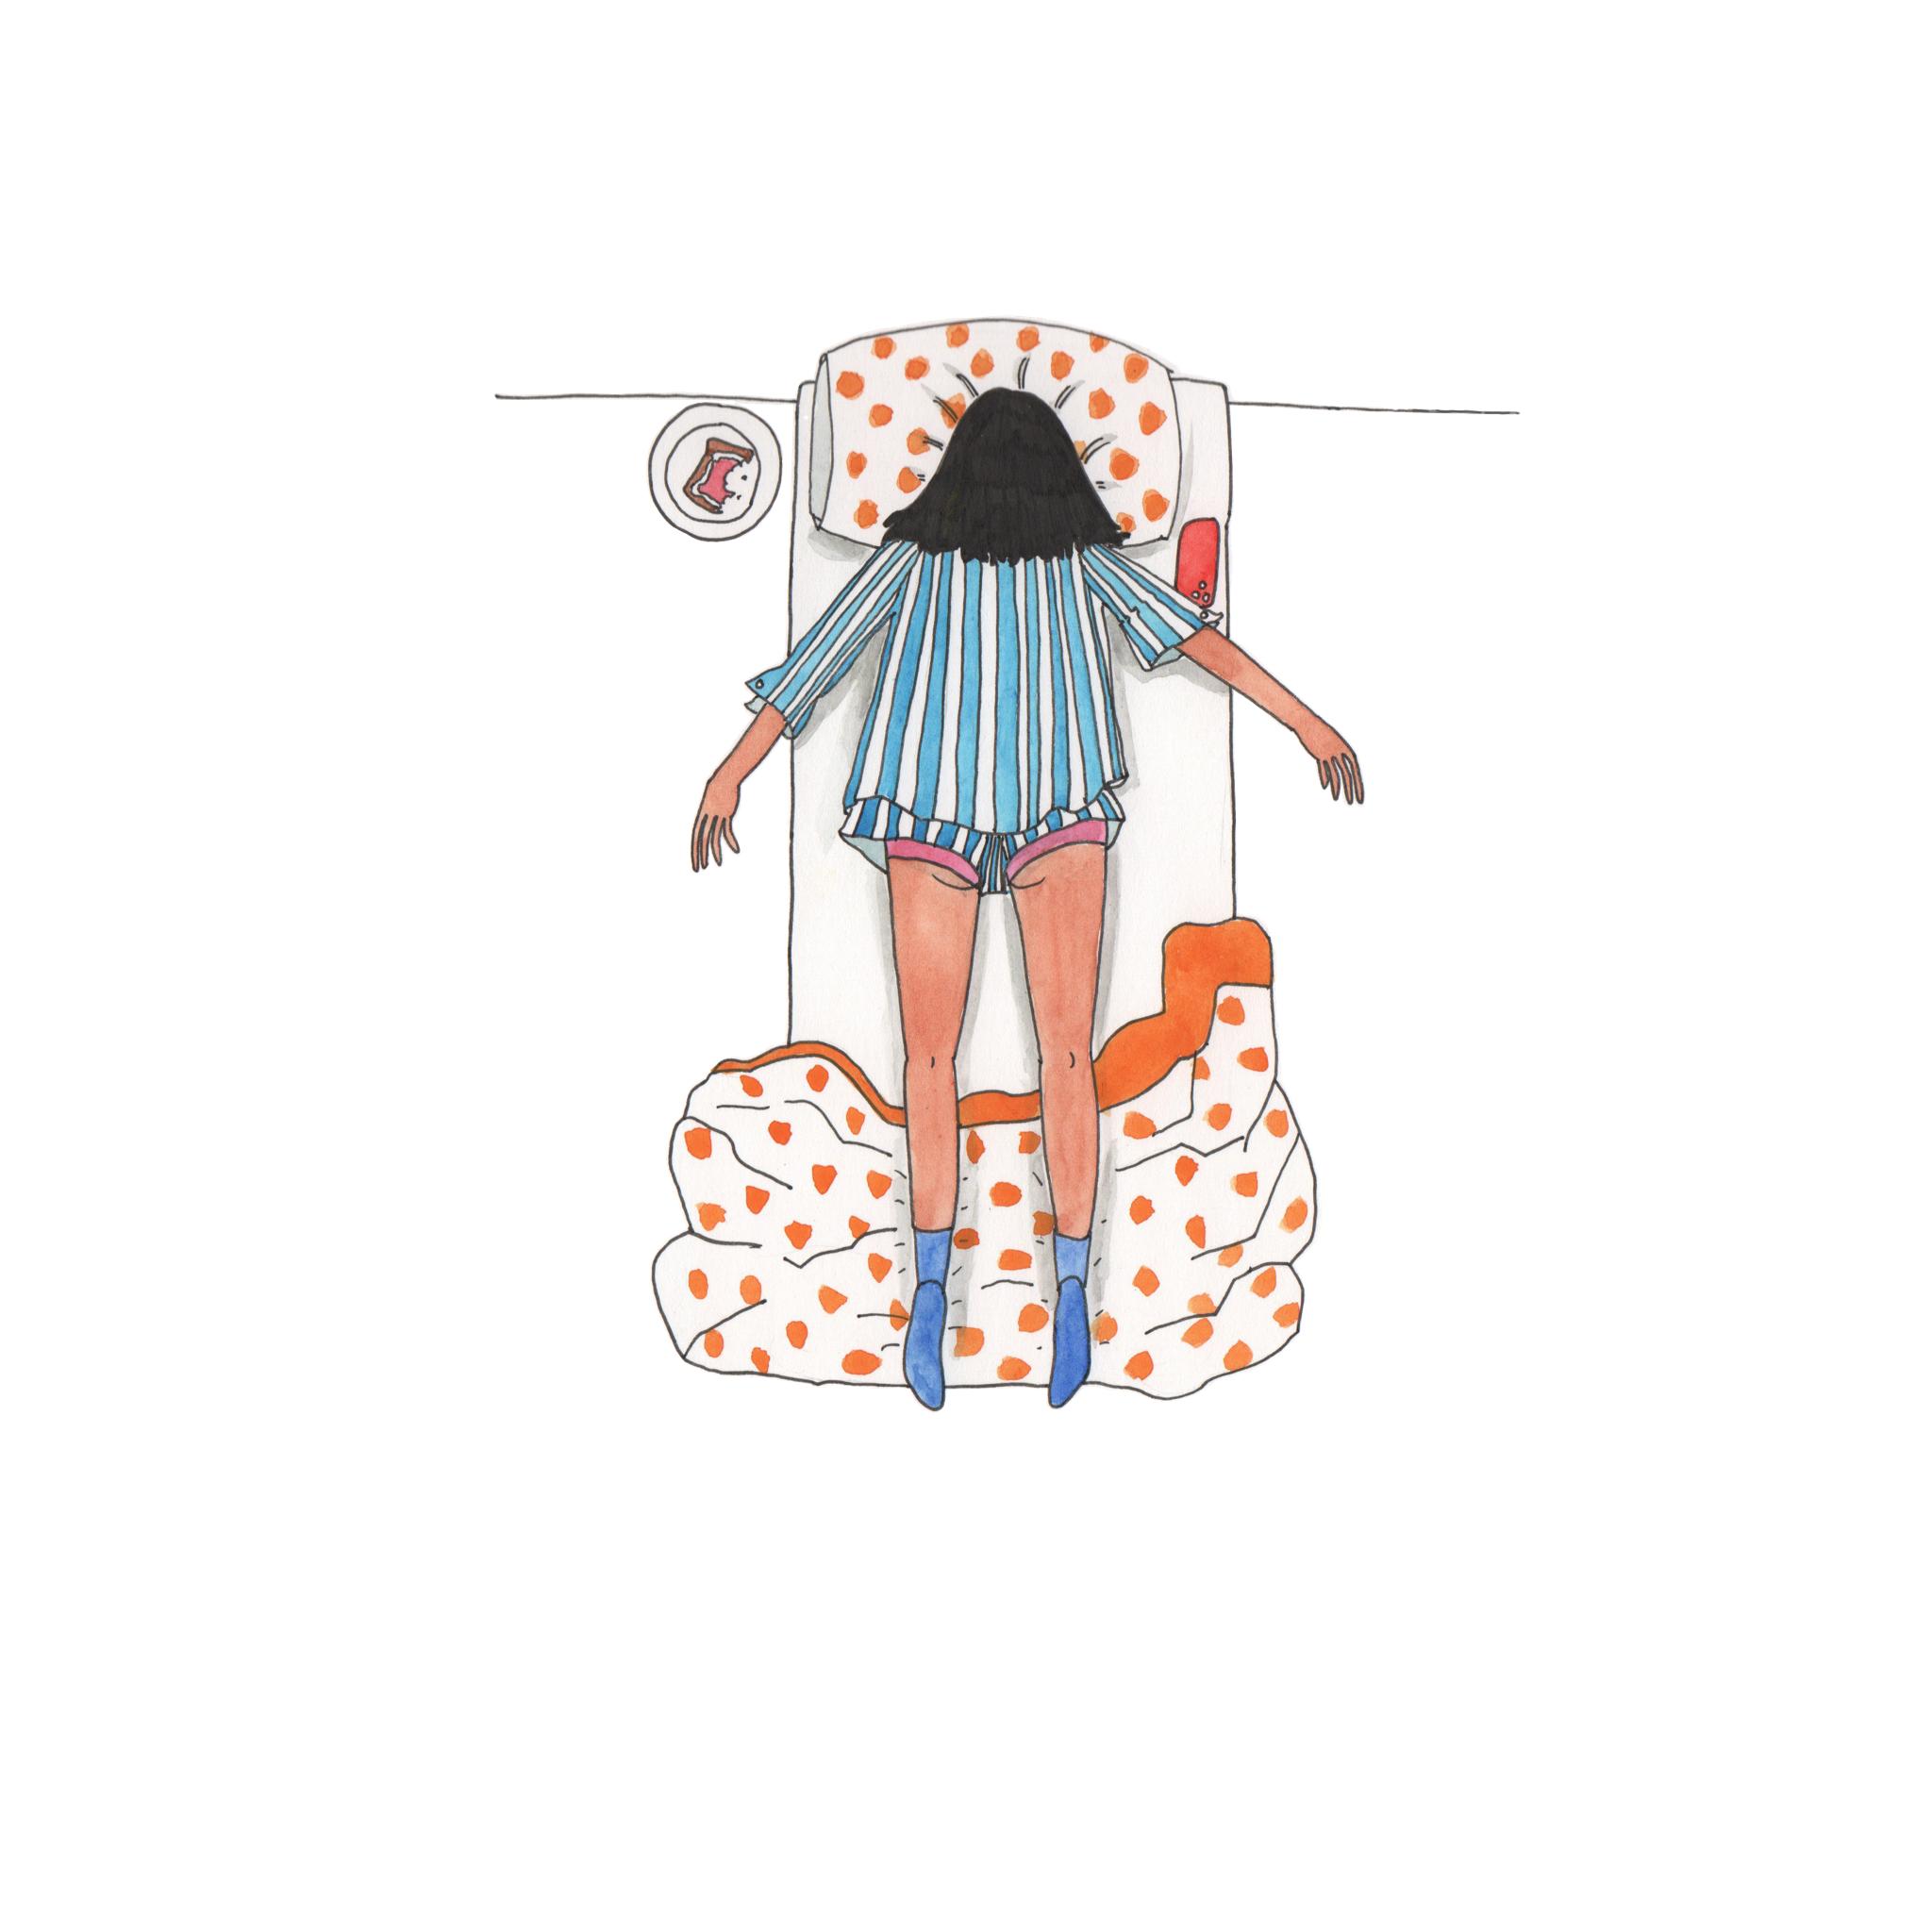 Emma Allegretti - self discipline is really really hard (courtesy of the artist)